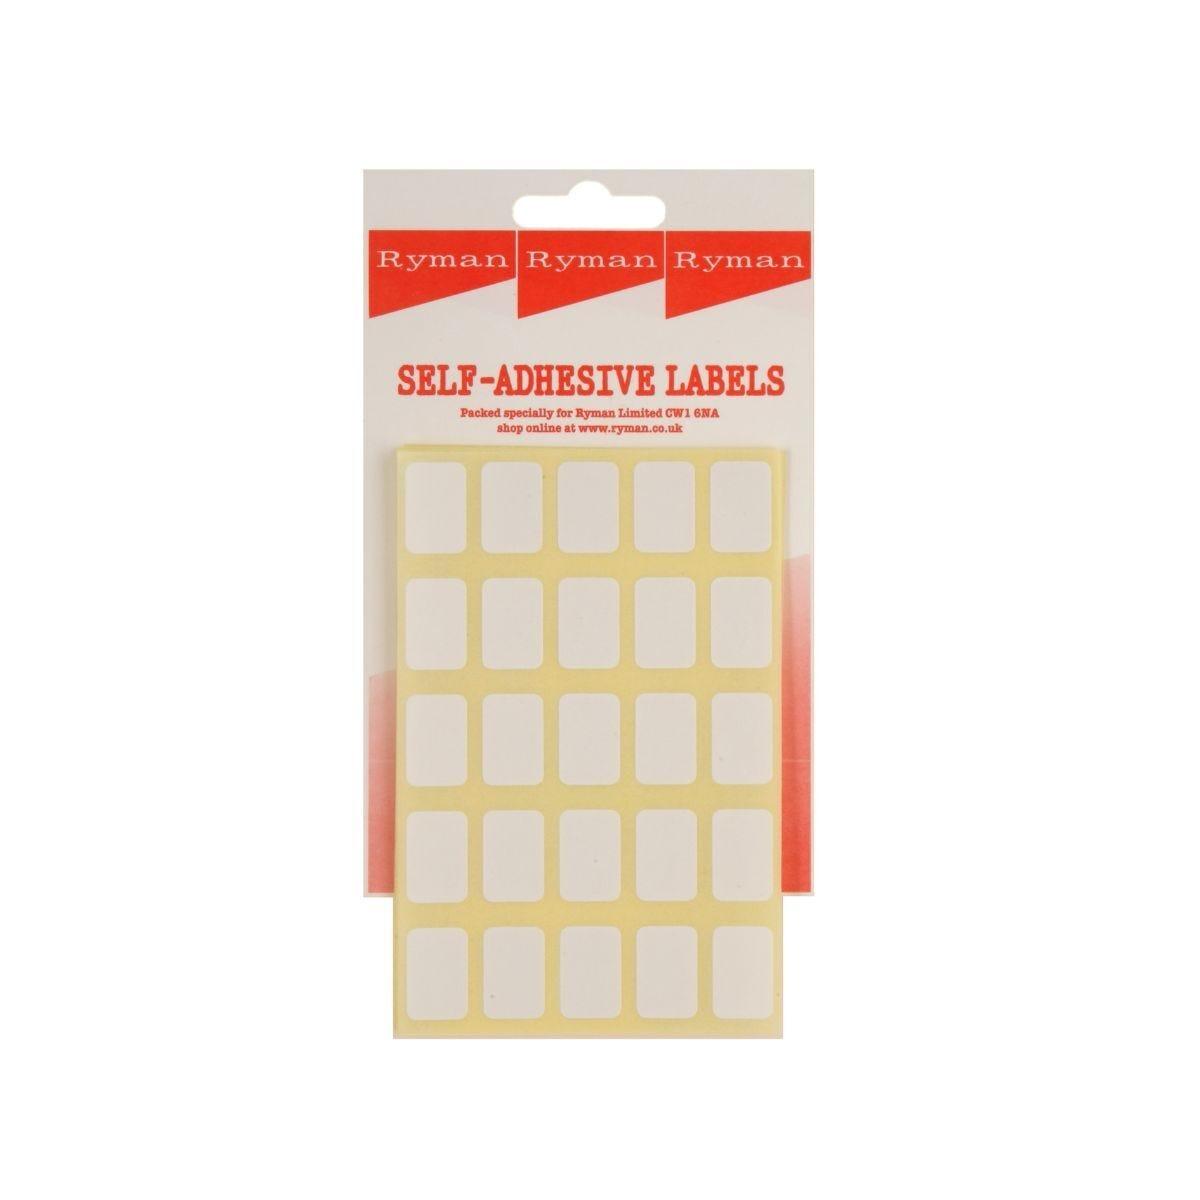 Ryman Self Adhesive Labels 18x12mm 25 per Sheet Pack of 250